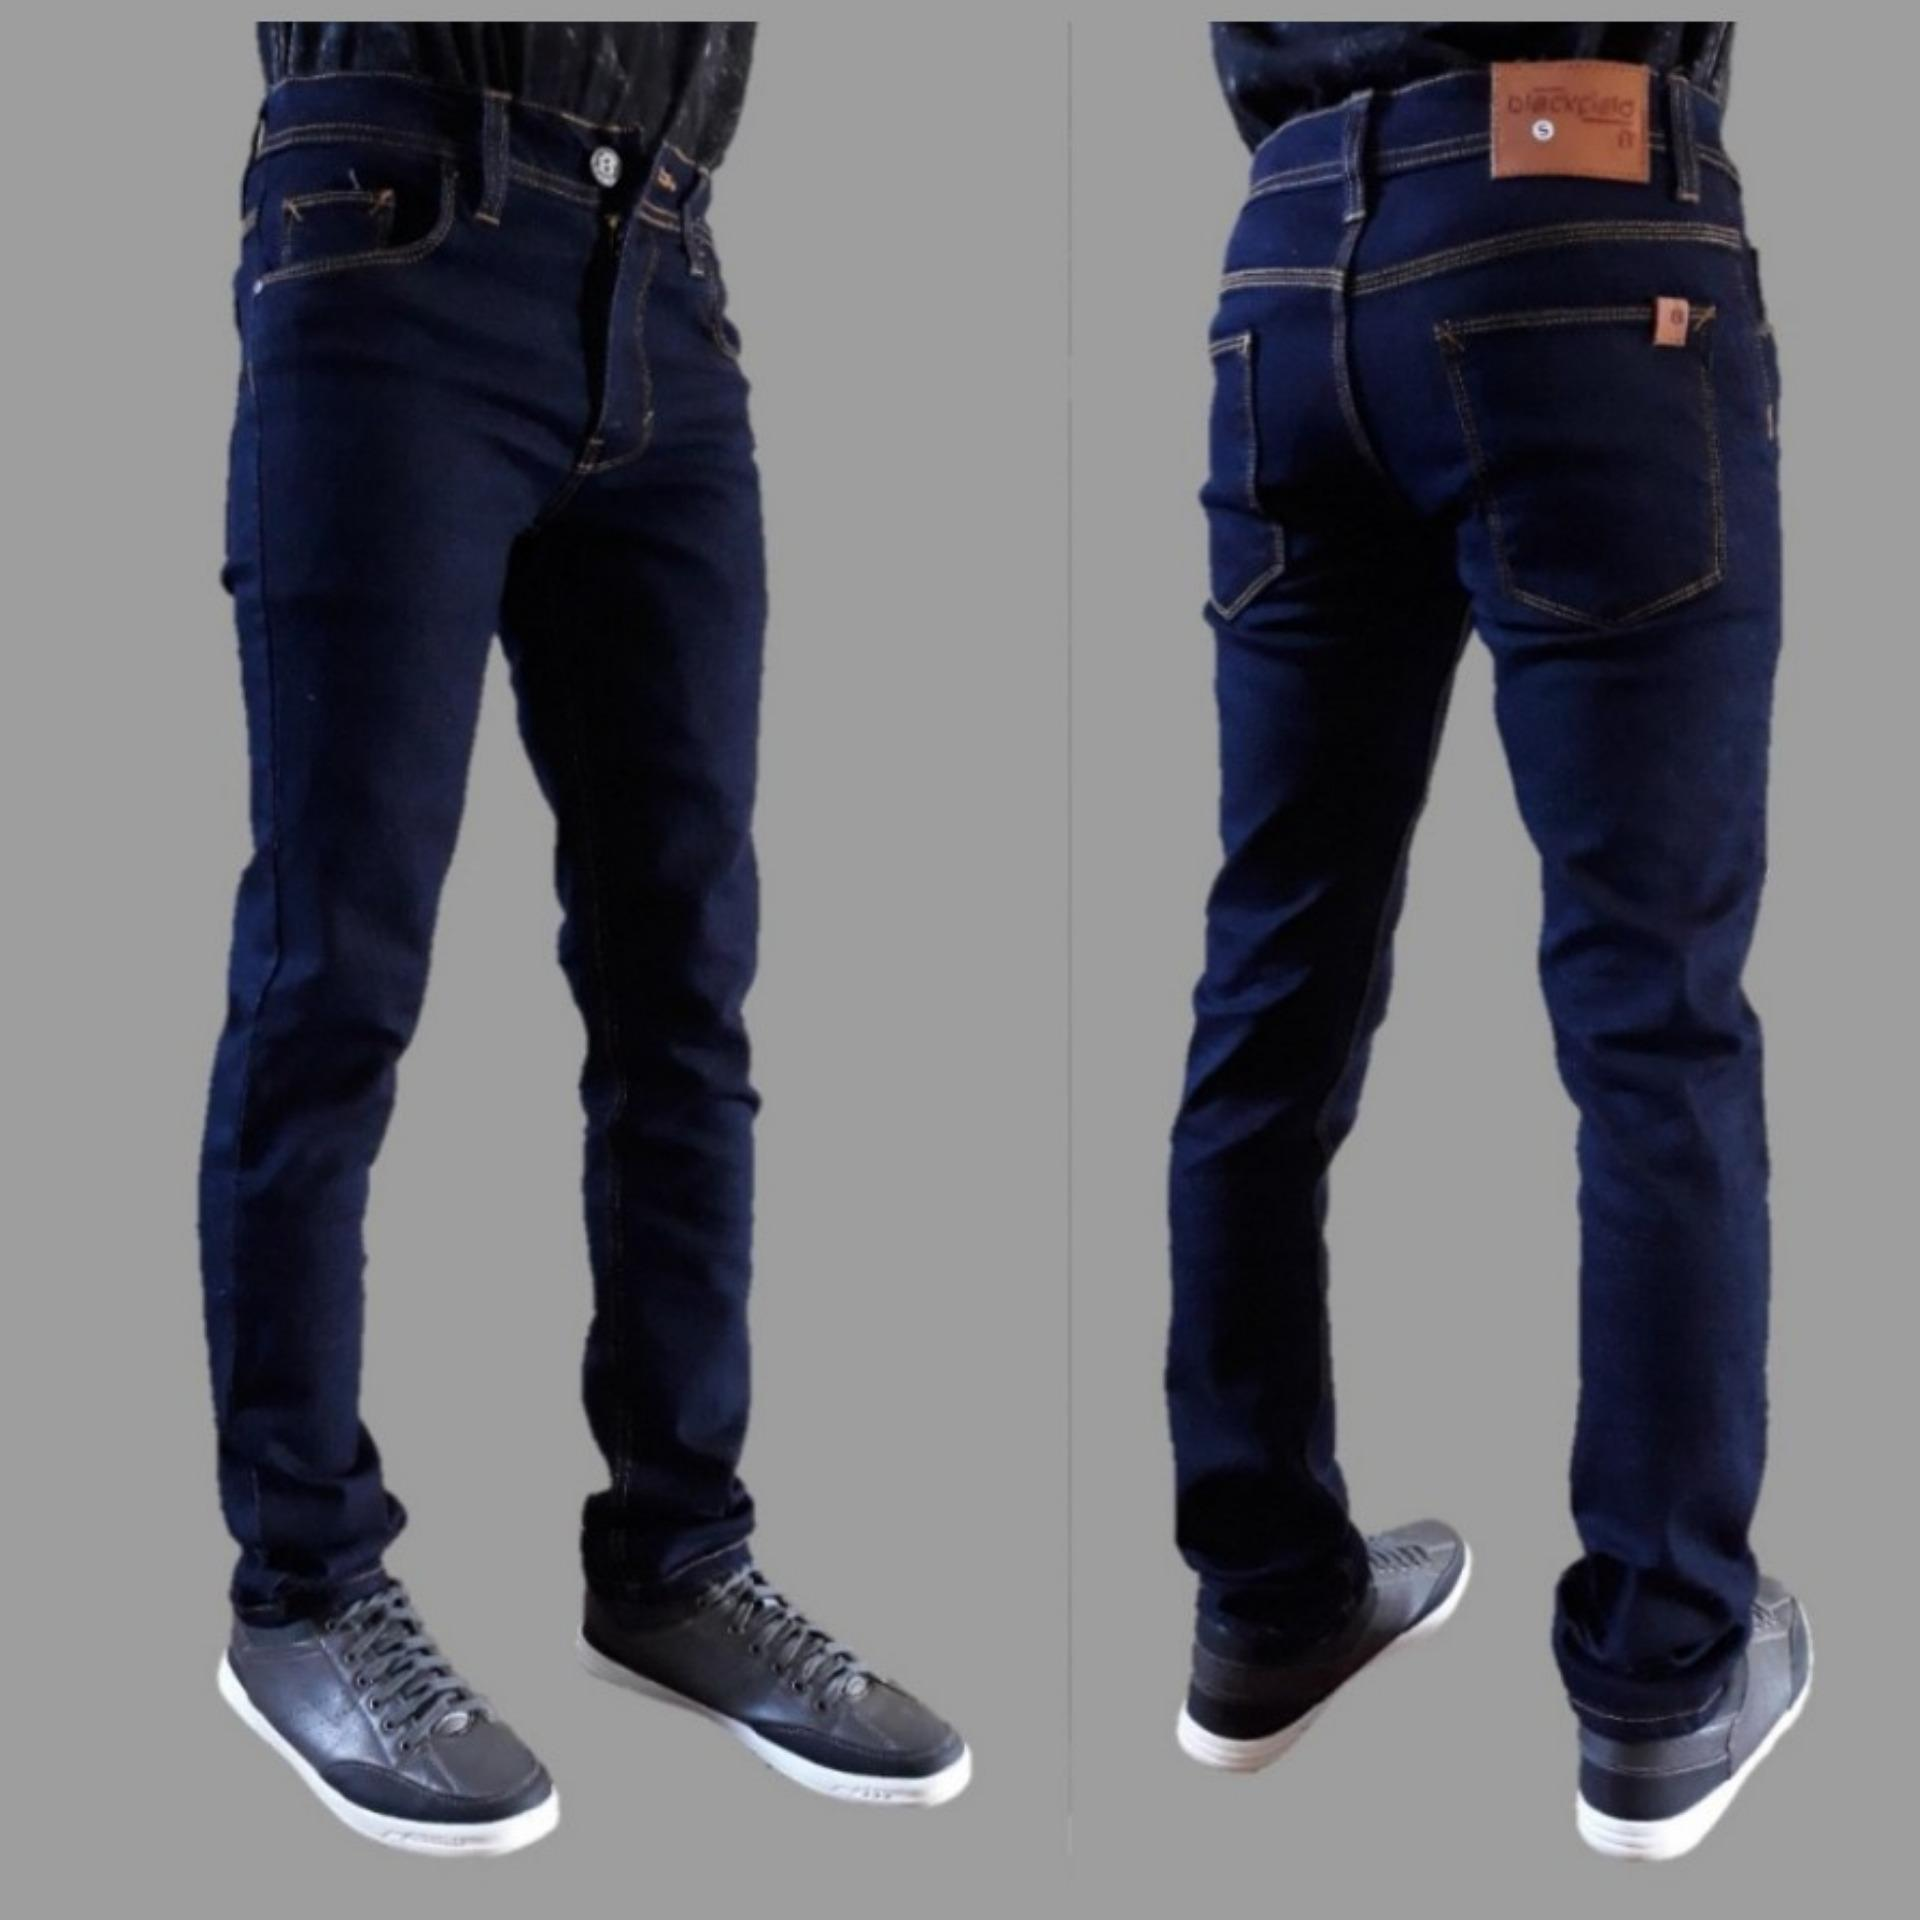 Celana jeans pria / jeans skinny / jeans pensil / jeans slim fit pria /Jeans Garment Pria Fashion Casual